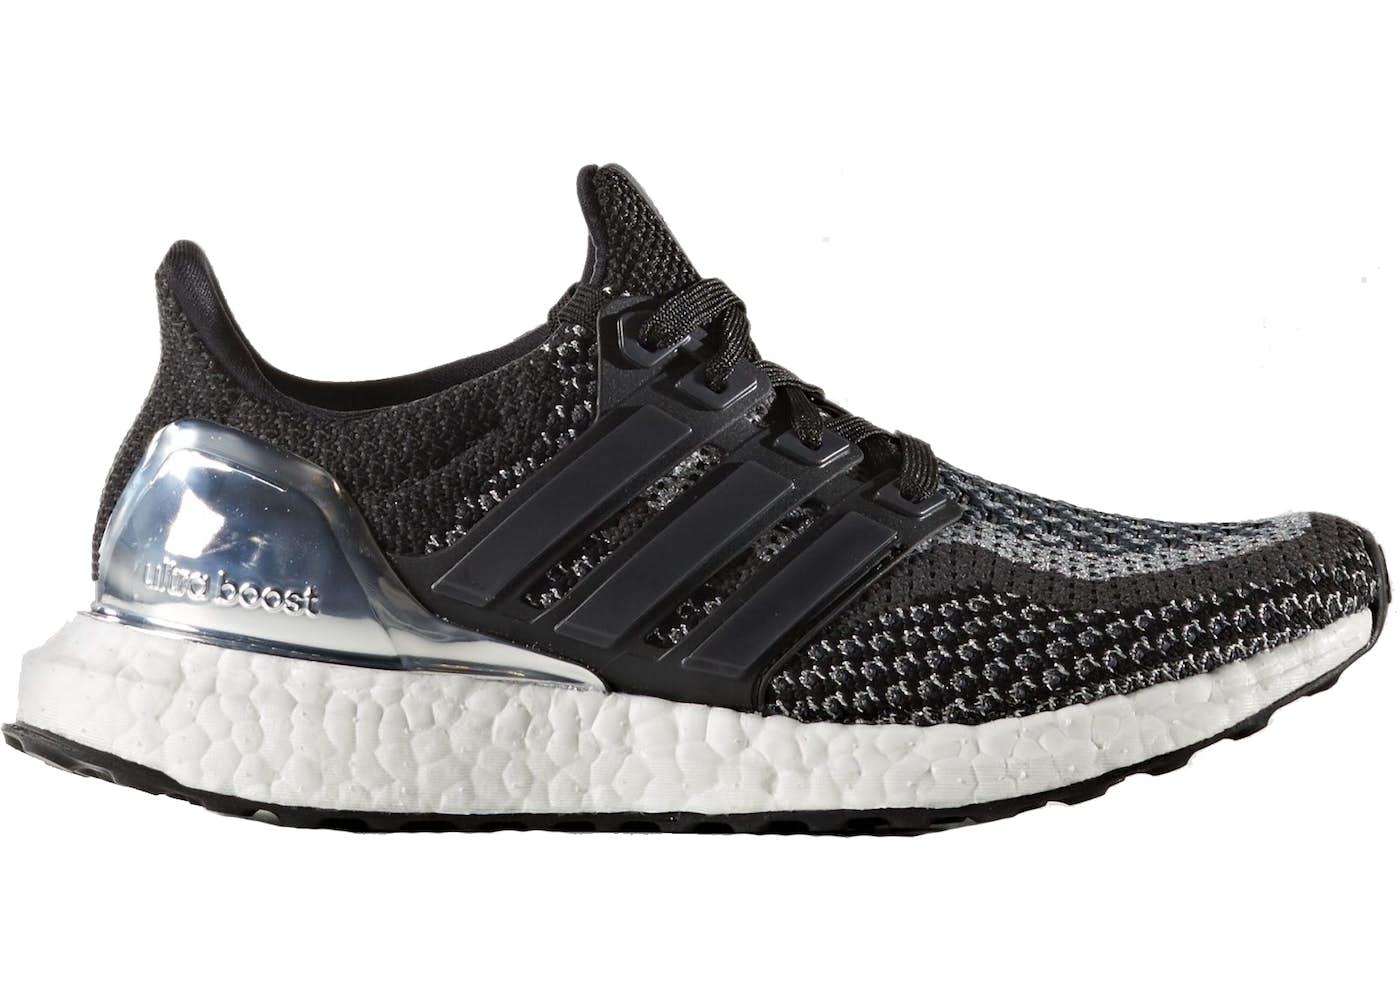 adidas ultra boost 2.0 black